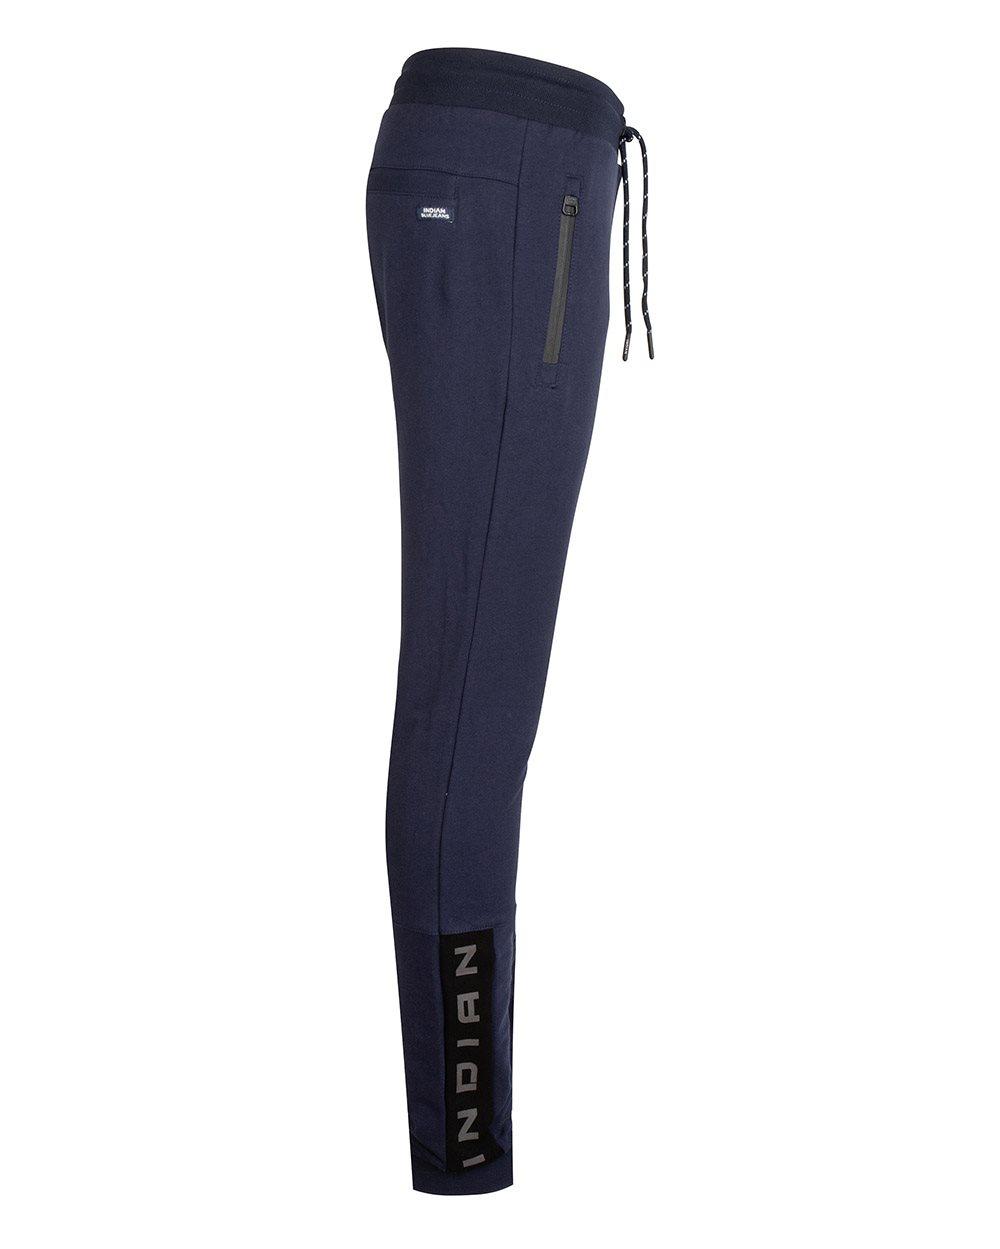 IBJ sweatpants